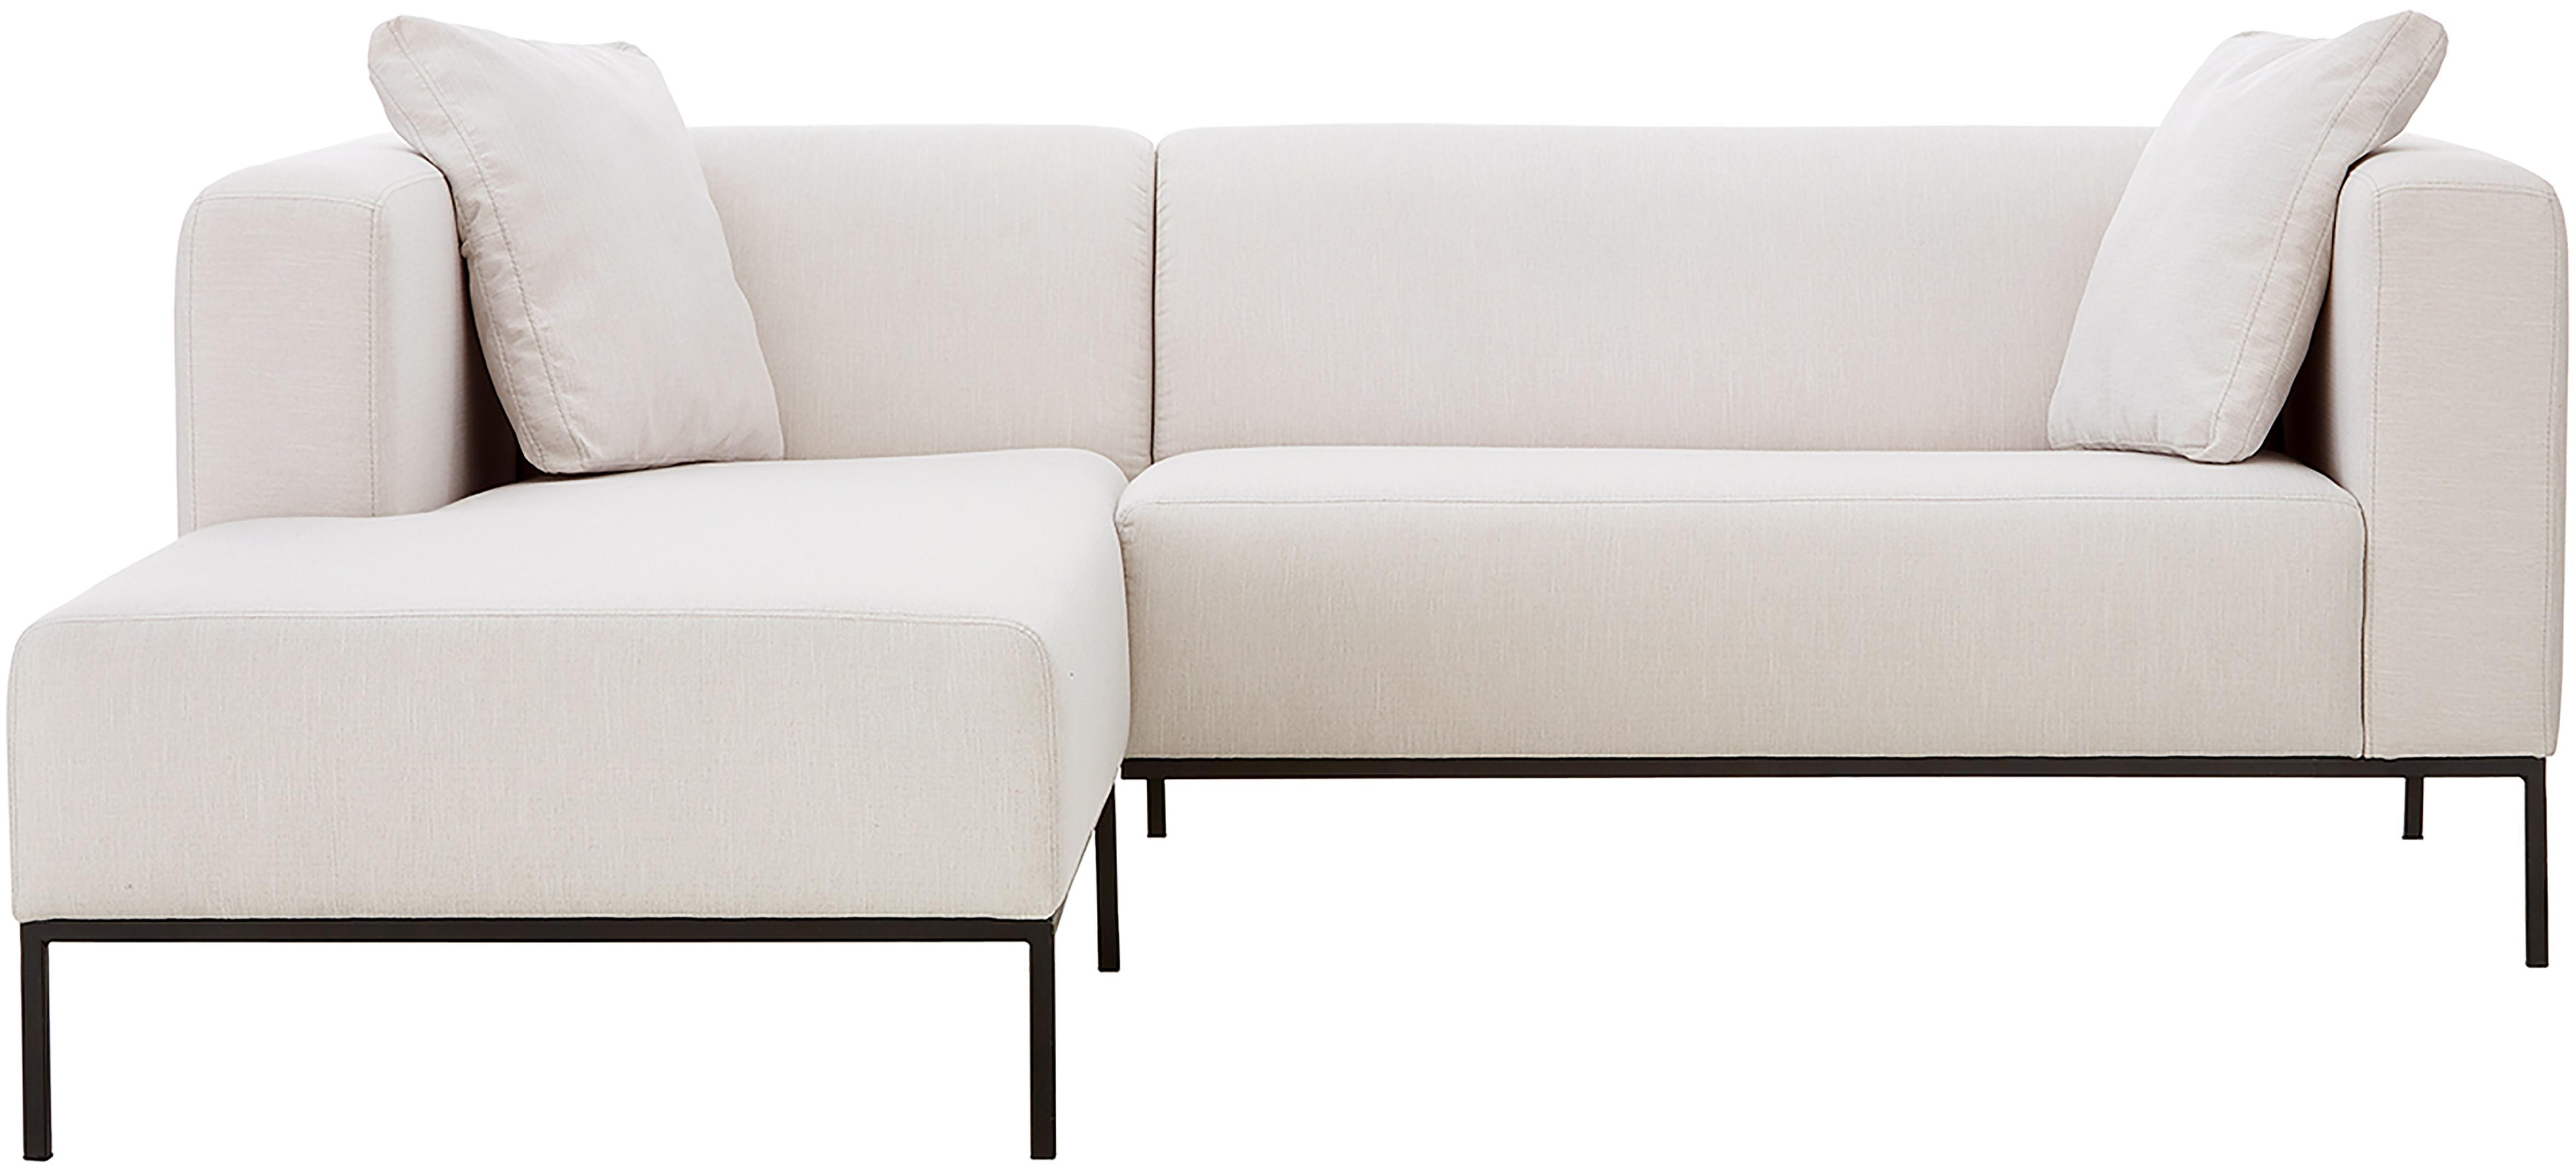 Ecksofa Carrie, Bezug: Polyester 50.000 Scheuert, Gestell: Spanholz, Hartfaserplatte, Webstoff Beige, B 222 x T 180 cm